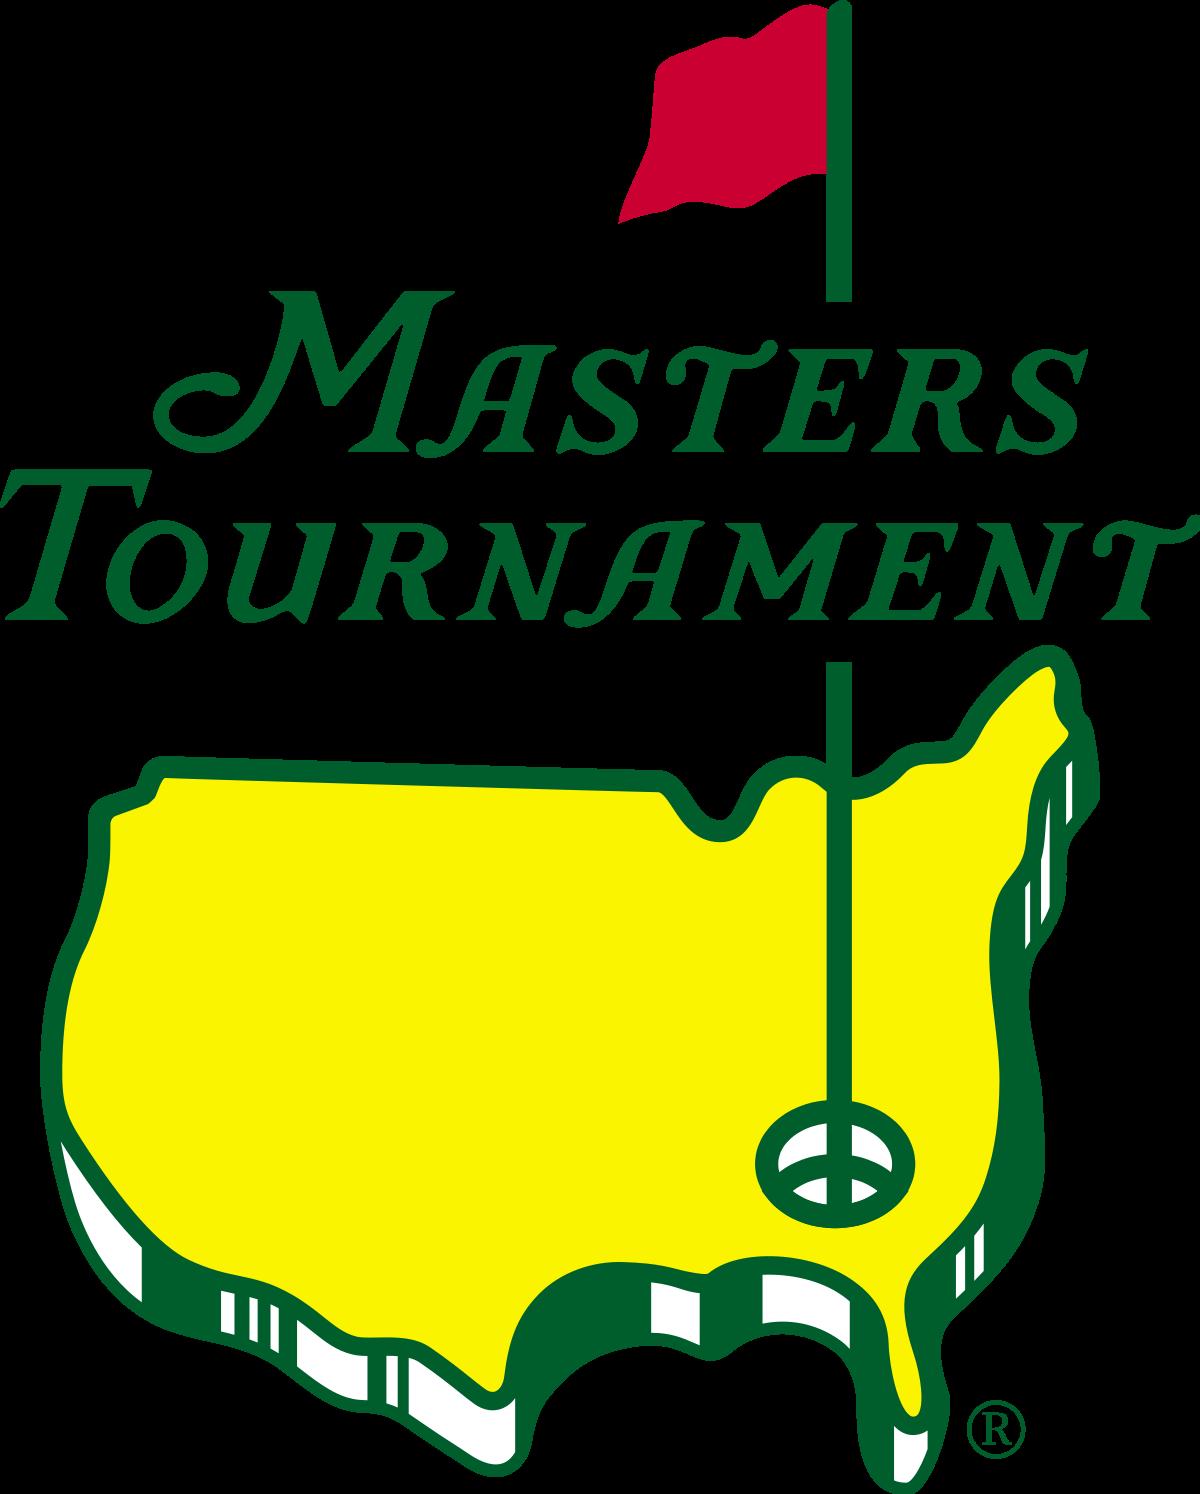 Masters tournament wikipedia . Golfer clipart pitch